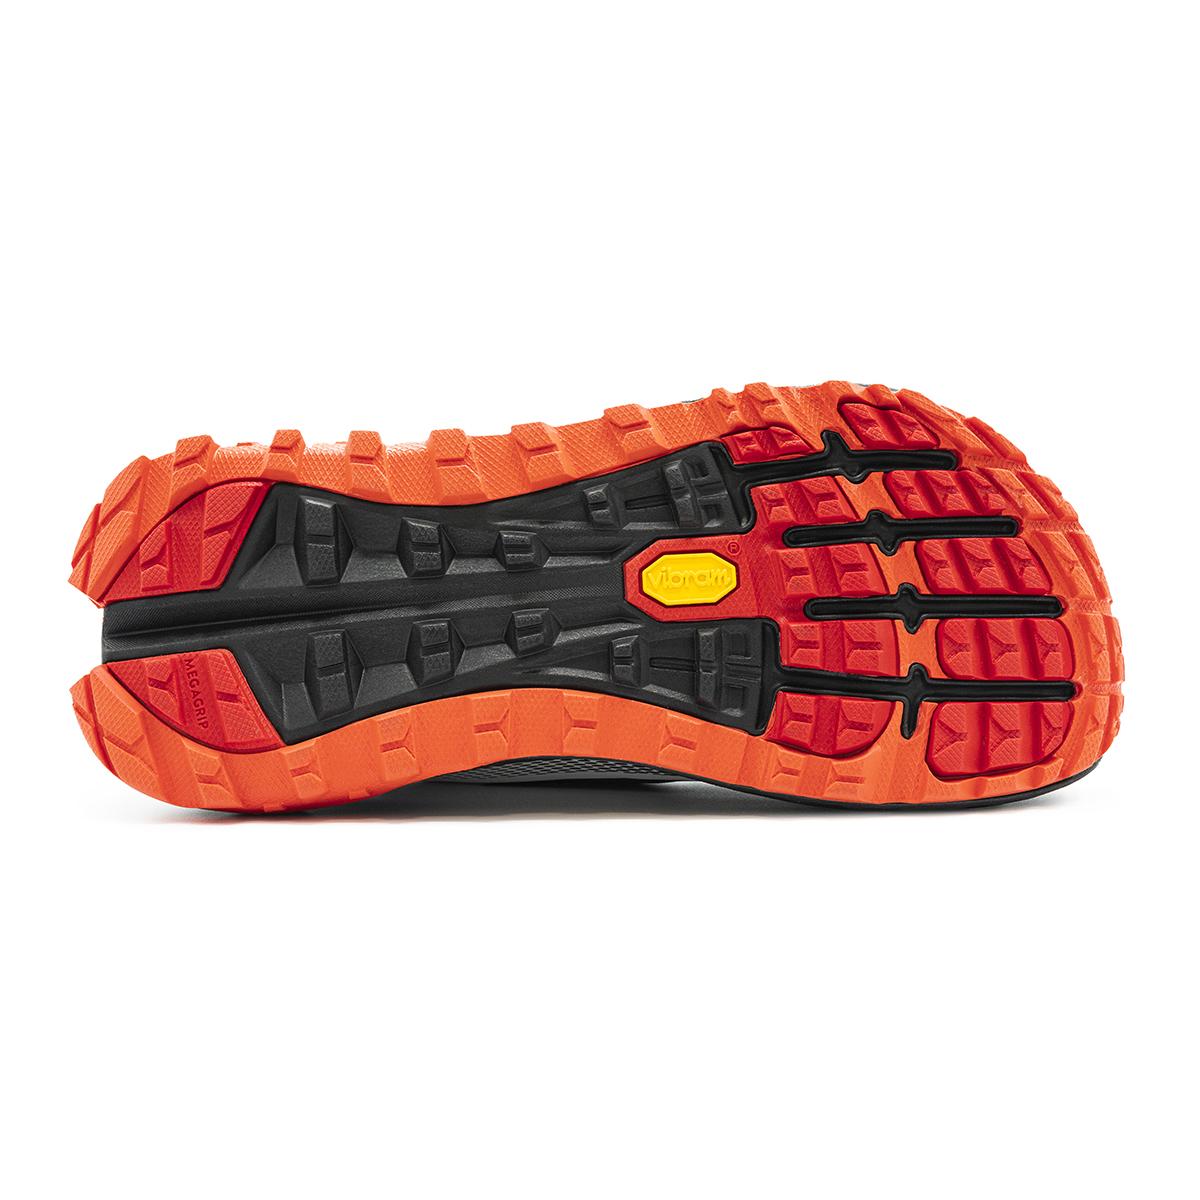 Men's Altra Olympus 4 Trail Running Shoe - Color: Black/White - Size: 12 - Width: Regular, Black/White, large, image 3